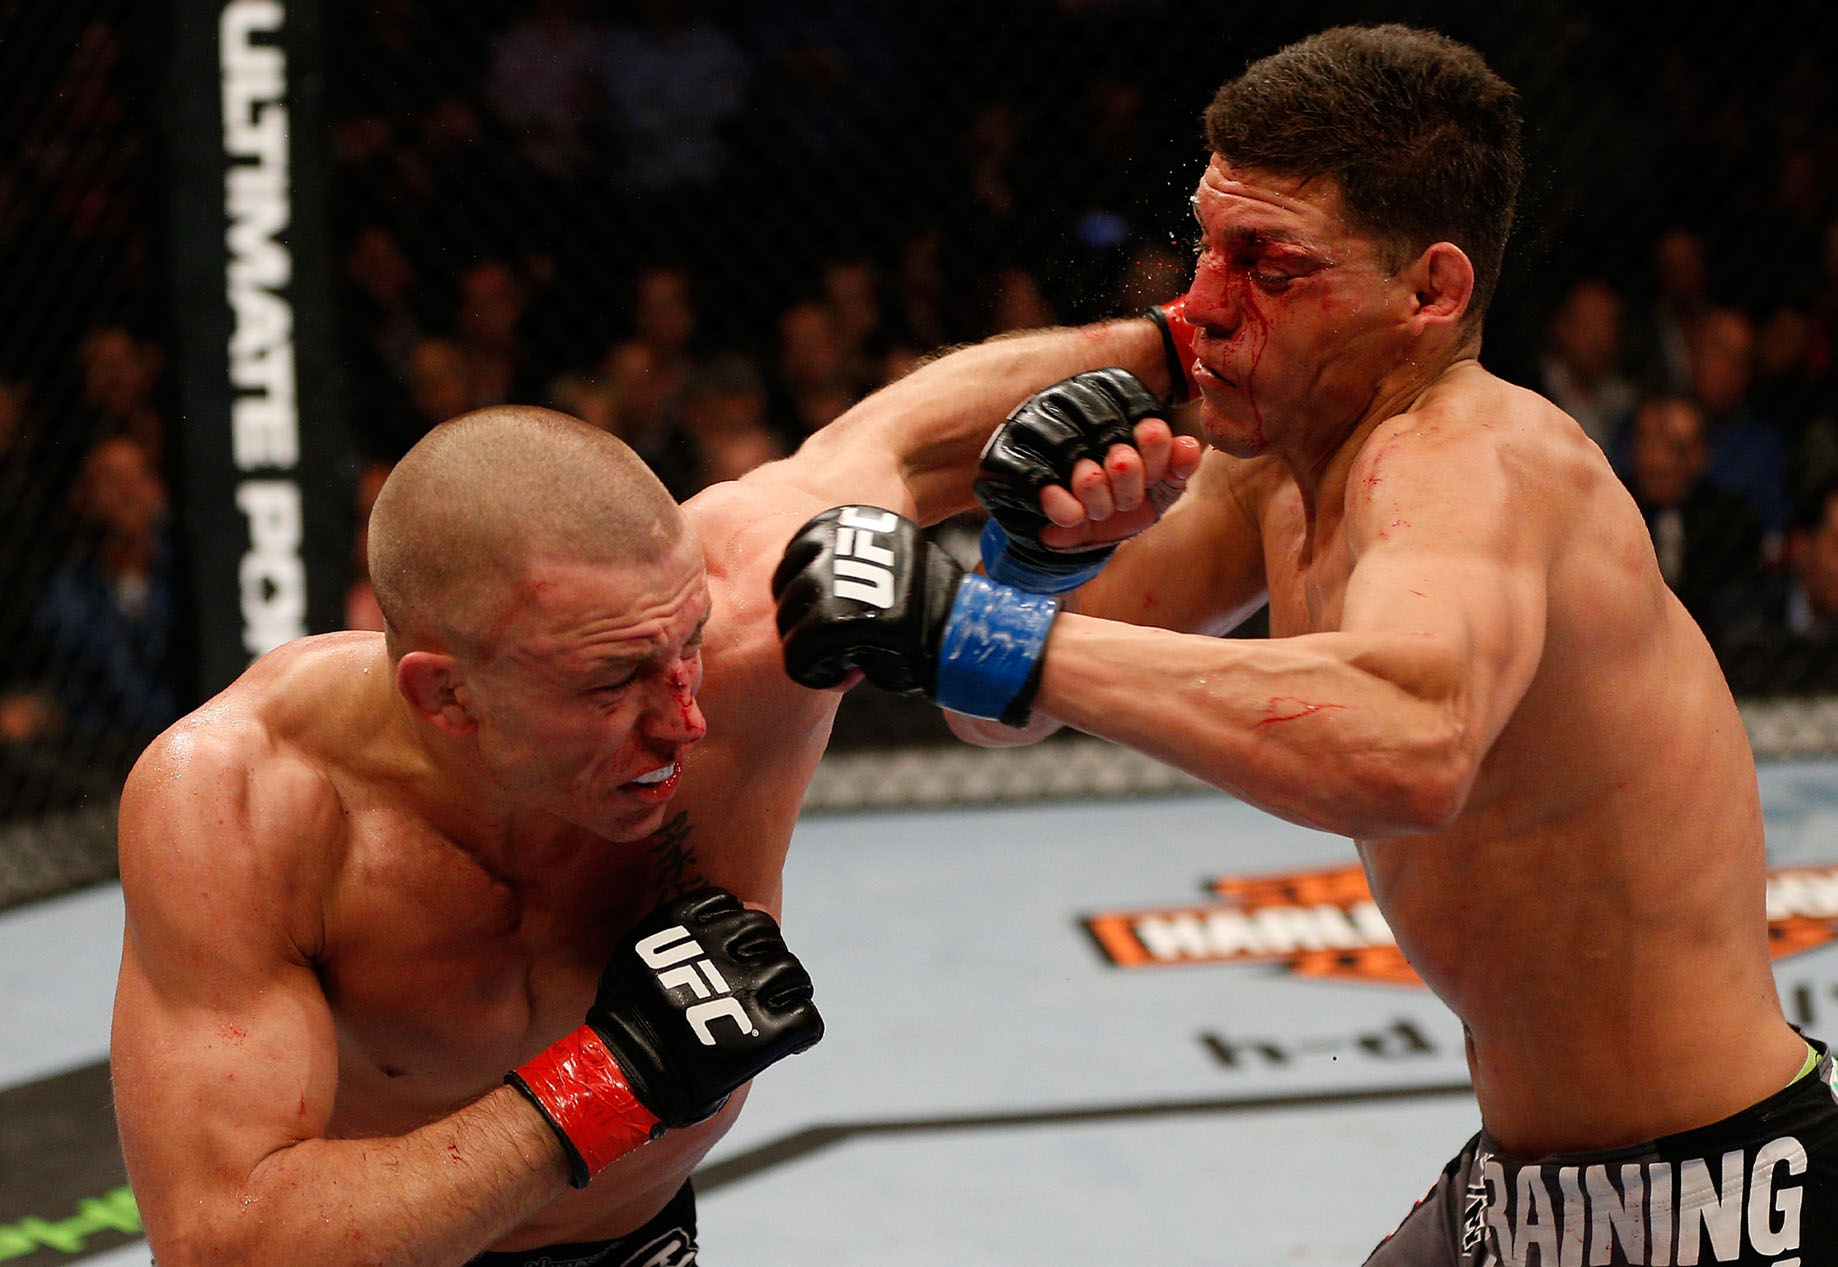 http://theactionelite.com/site/wp-content/uploads/2013/09/St-Pierre-v-Diaz-UFC-158.jpg